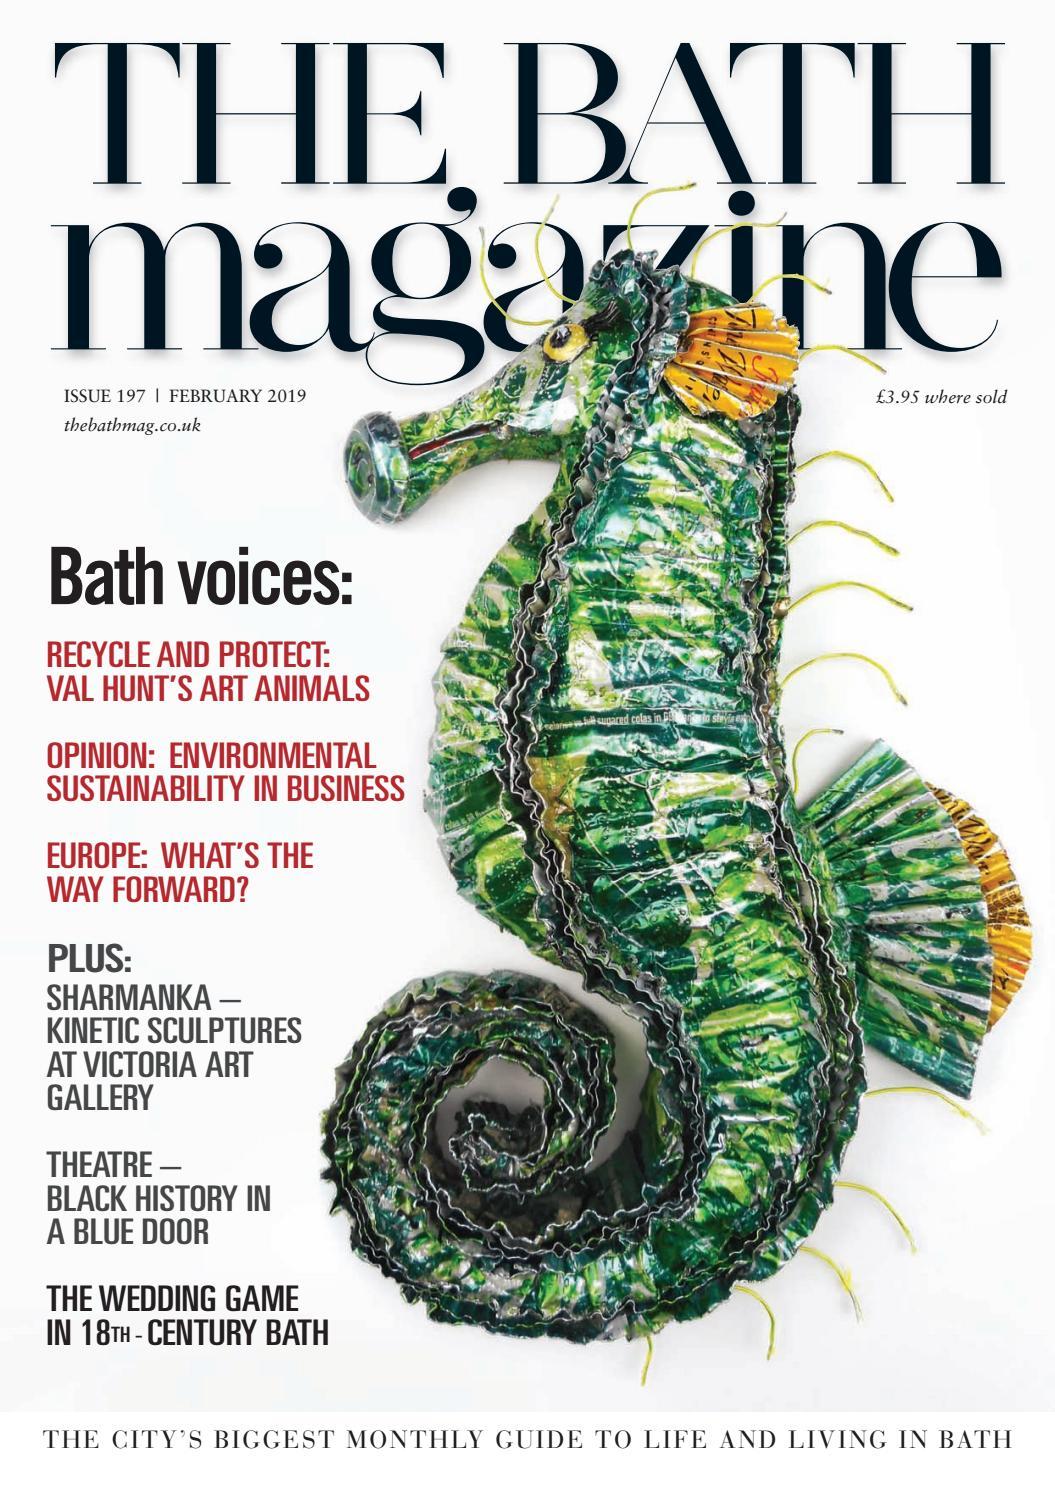 924536b89dca The Bath Magazine February 2019 by MC Publishing Limited - issuu